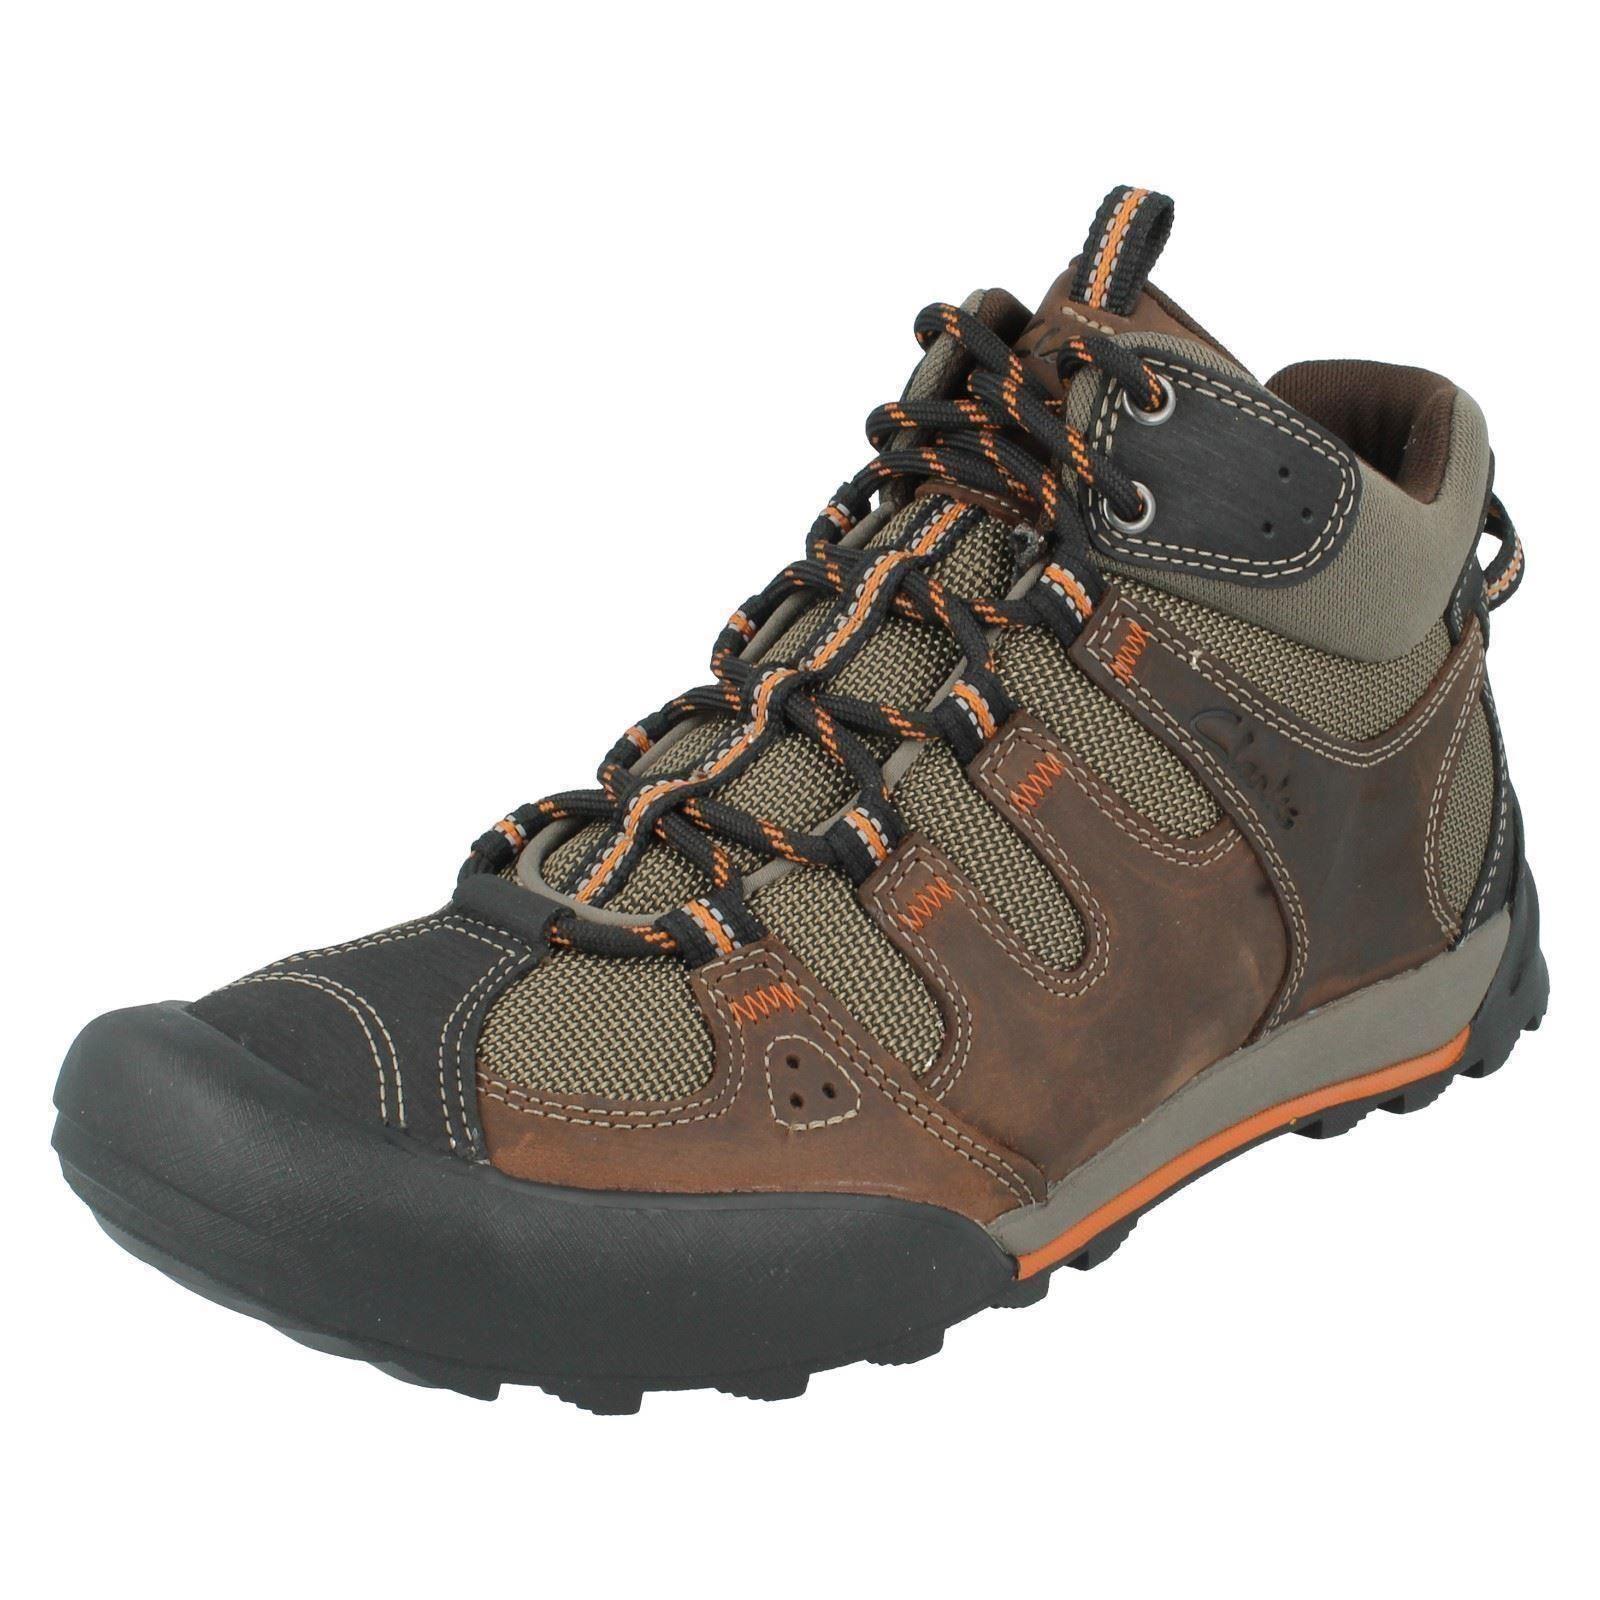 Regatta Men/'s Burrell Leather Vibram Walking Boots Brown